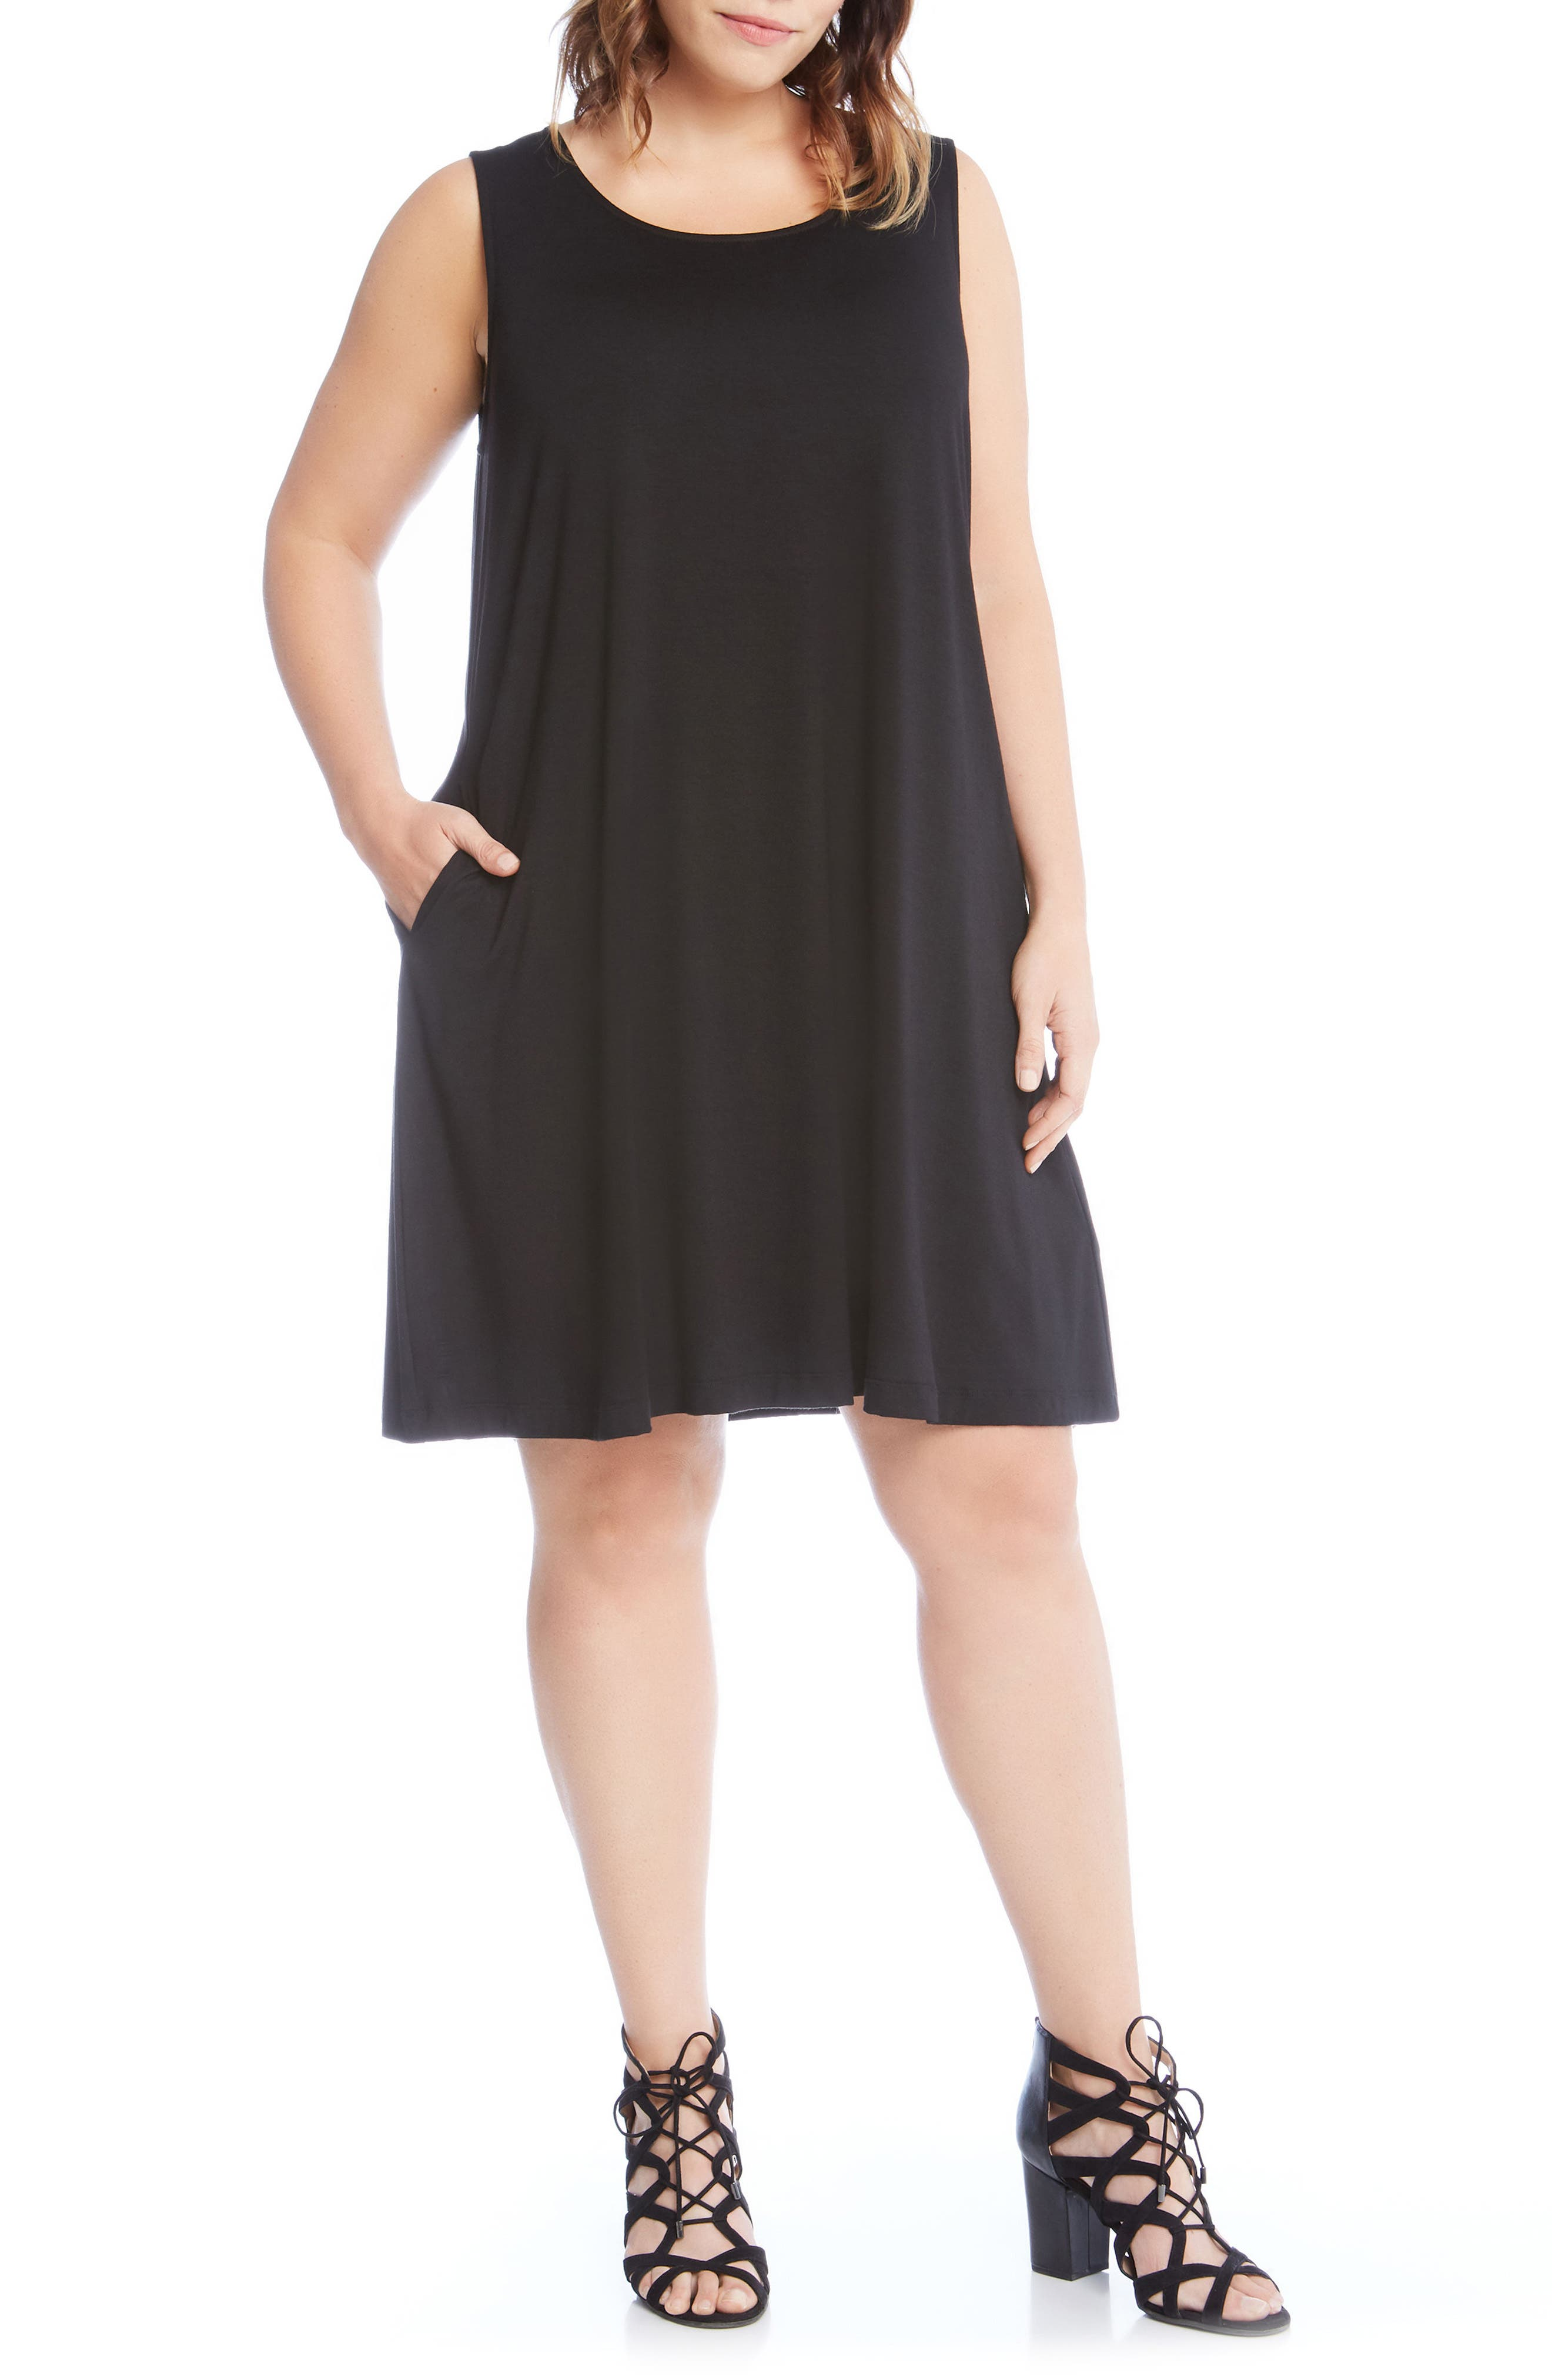 Chloe Swing Dress,                         Main,                         color, Black